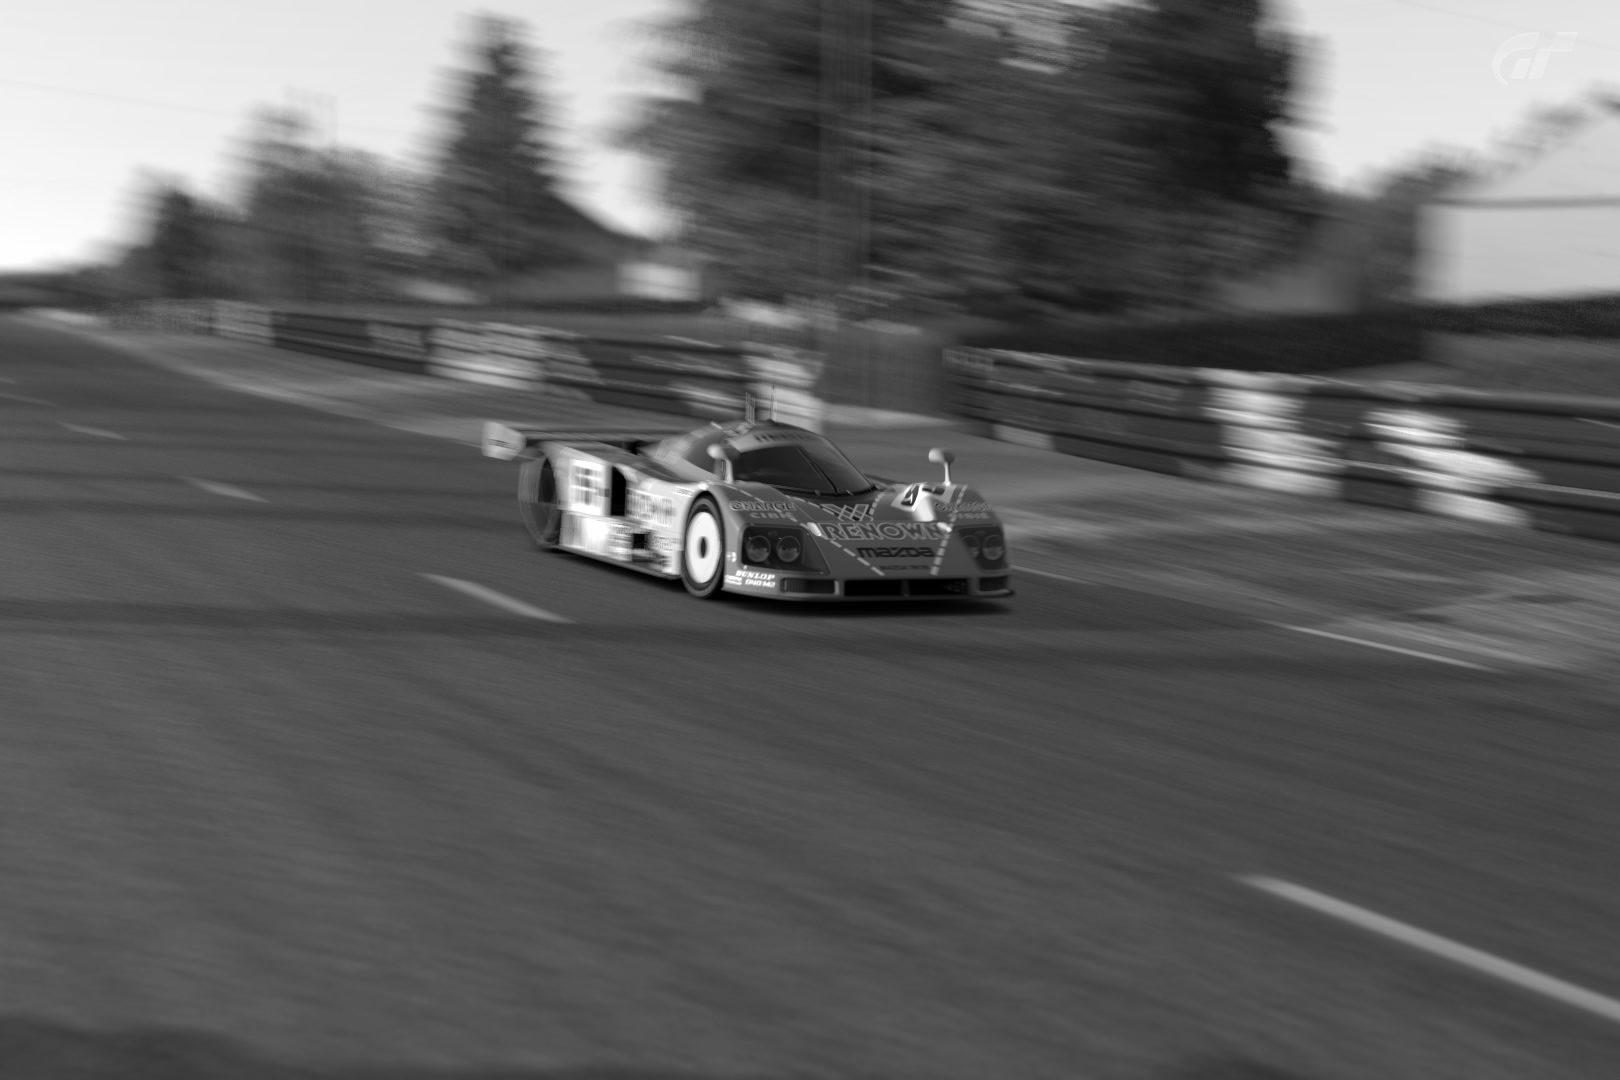 Circuit de la Sarthe 2013_15.jpg